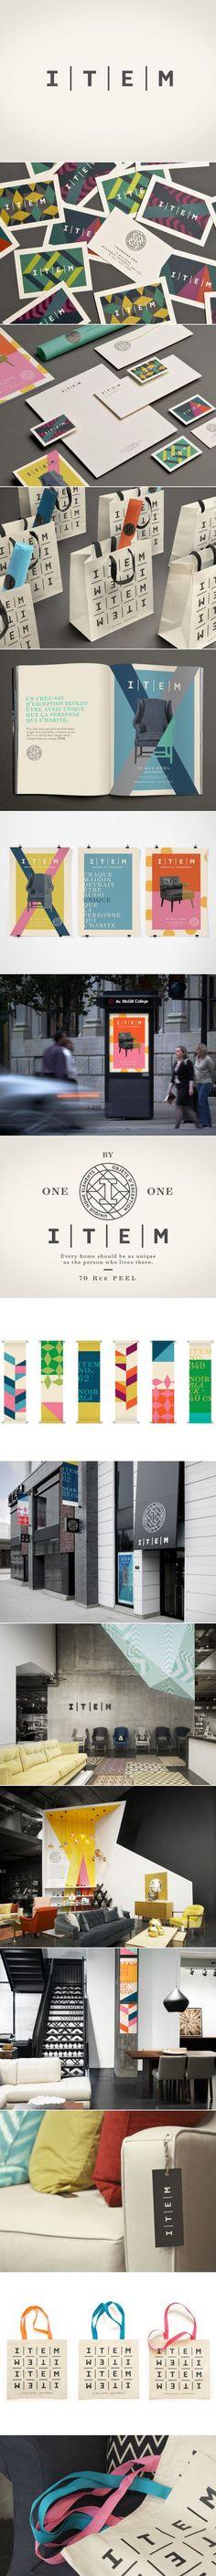 Item | Nouveau magasin / New store | Branding | lg2boutique - branding / identity - love the geometric design